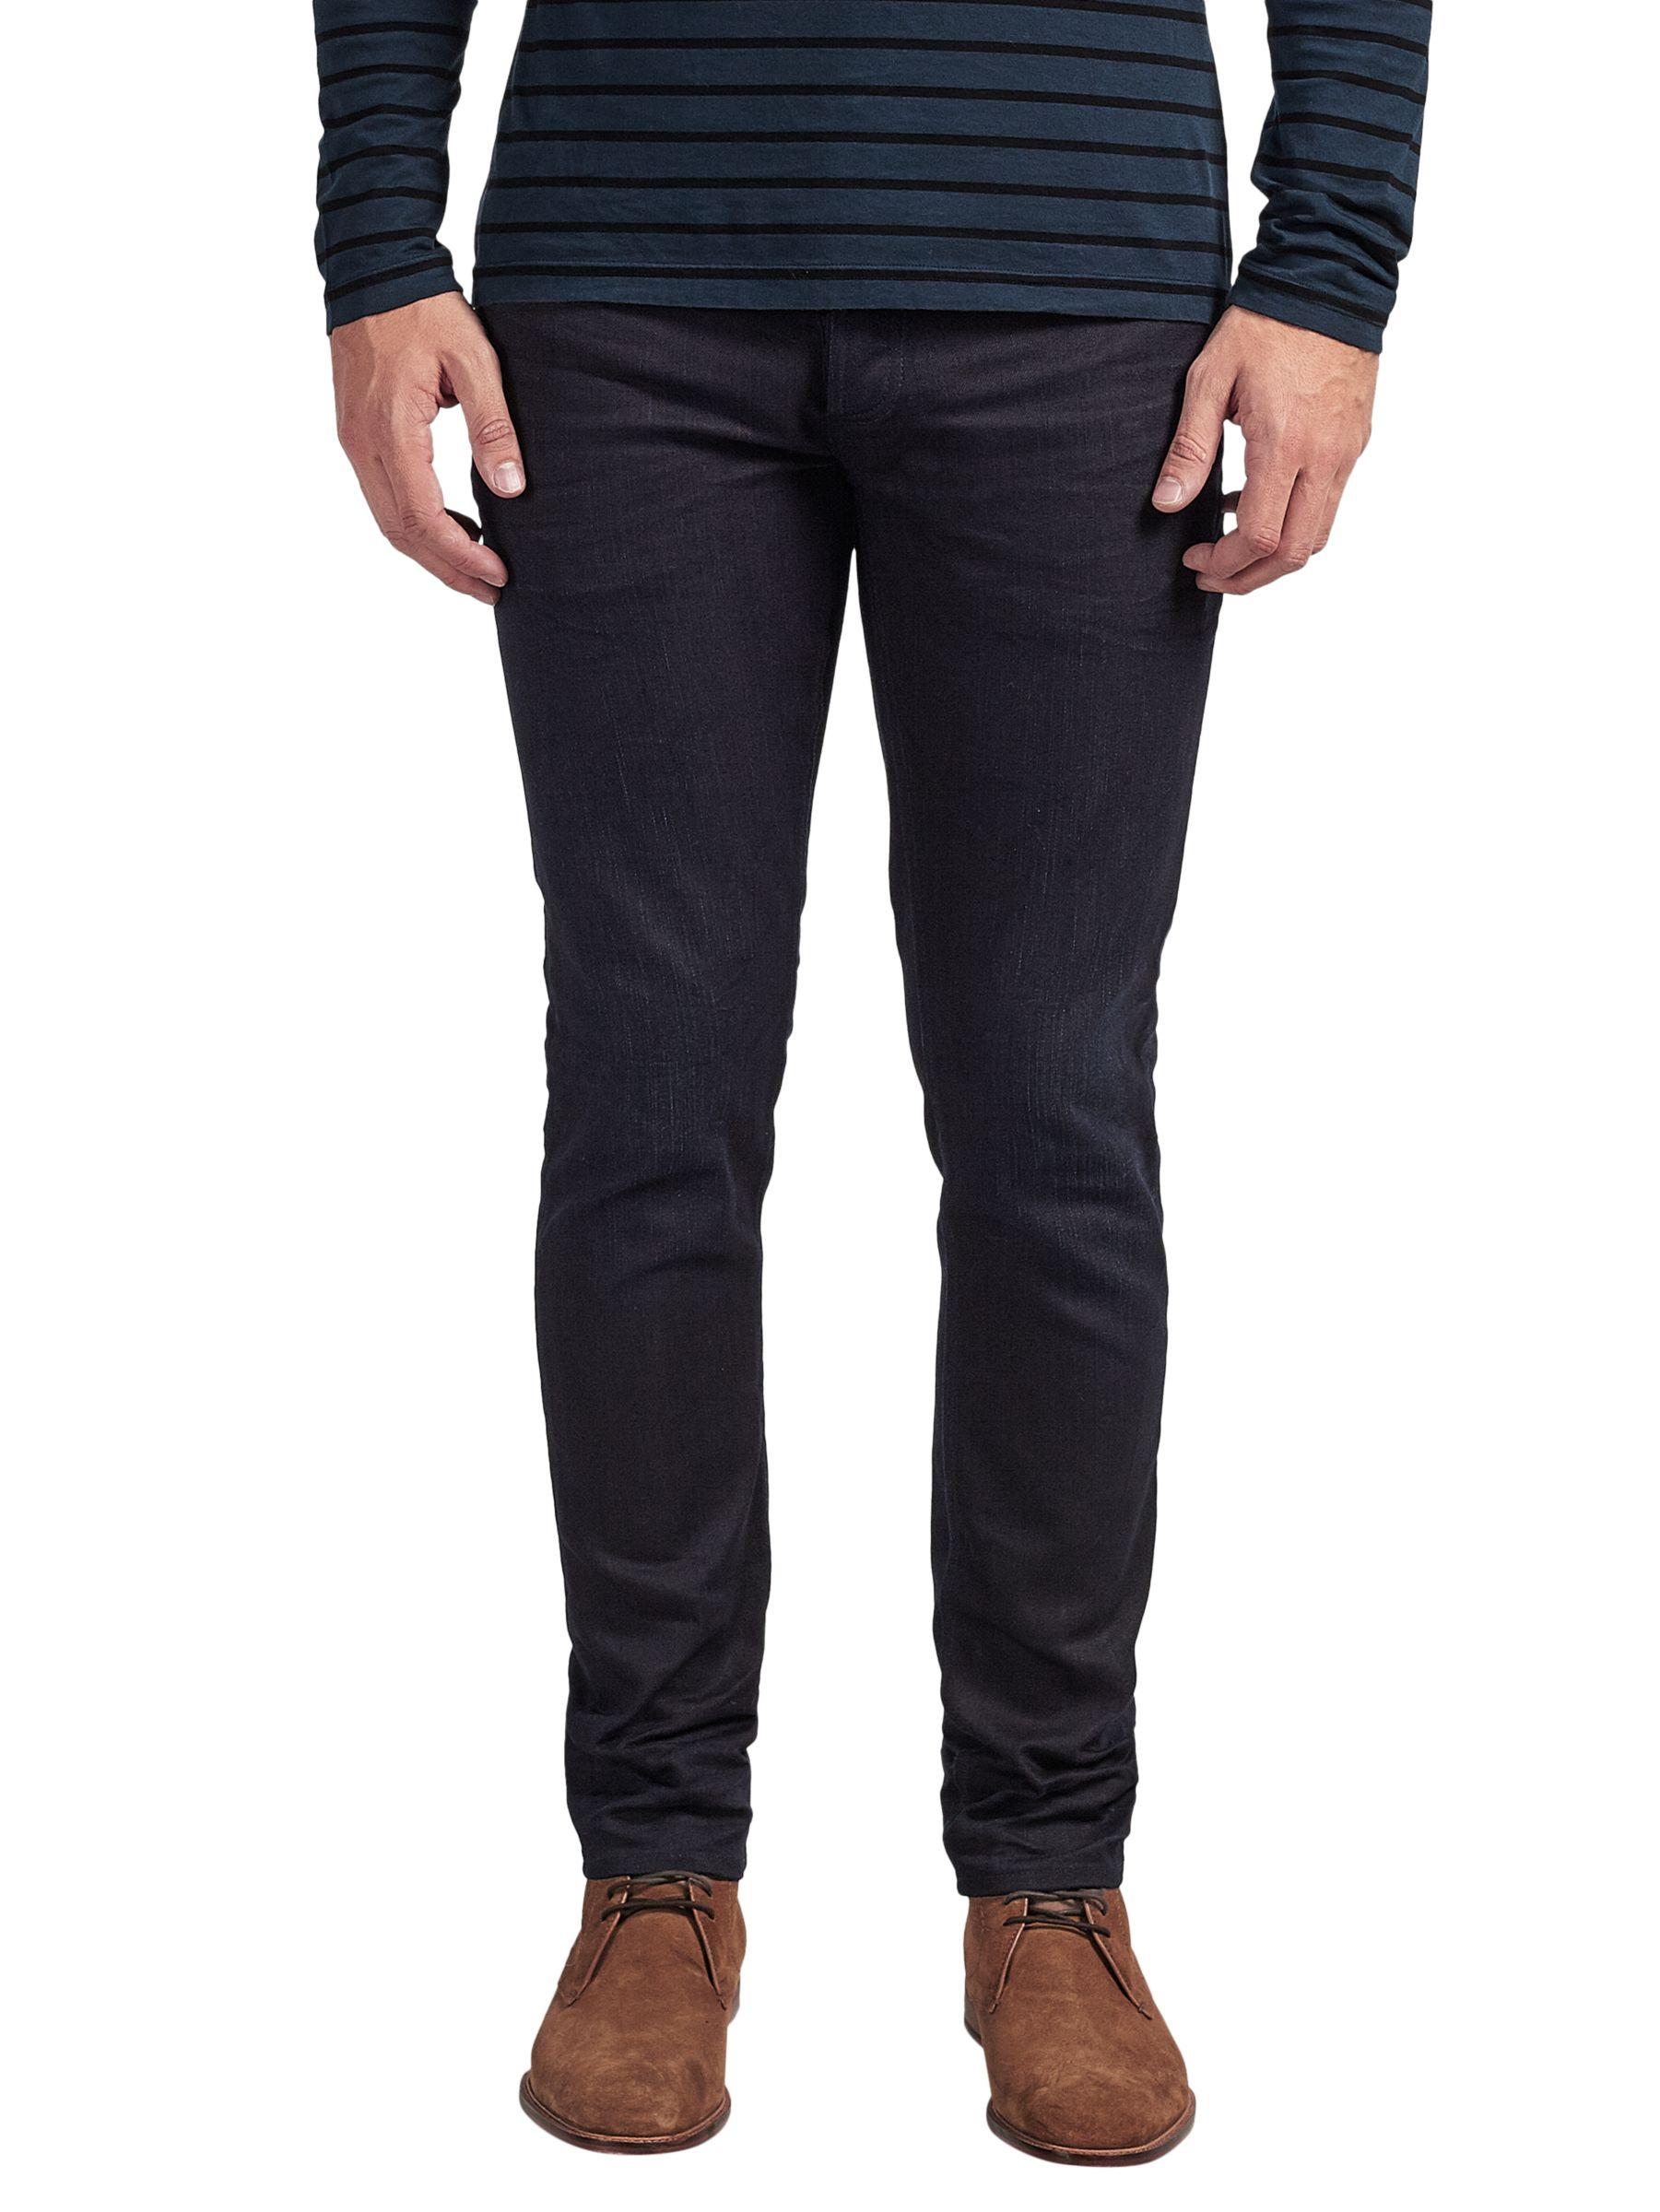 Denham Denham Razor AID153 Jeans, Indigo Dye